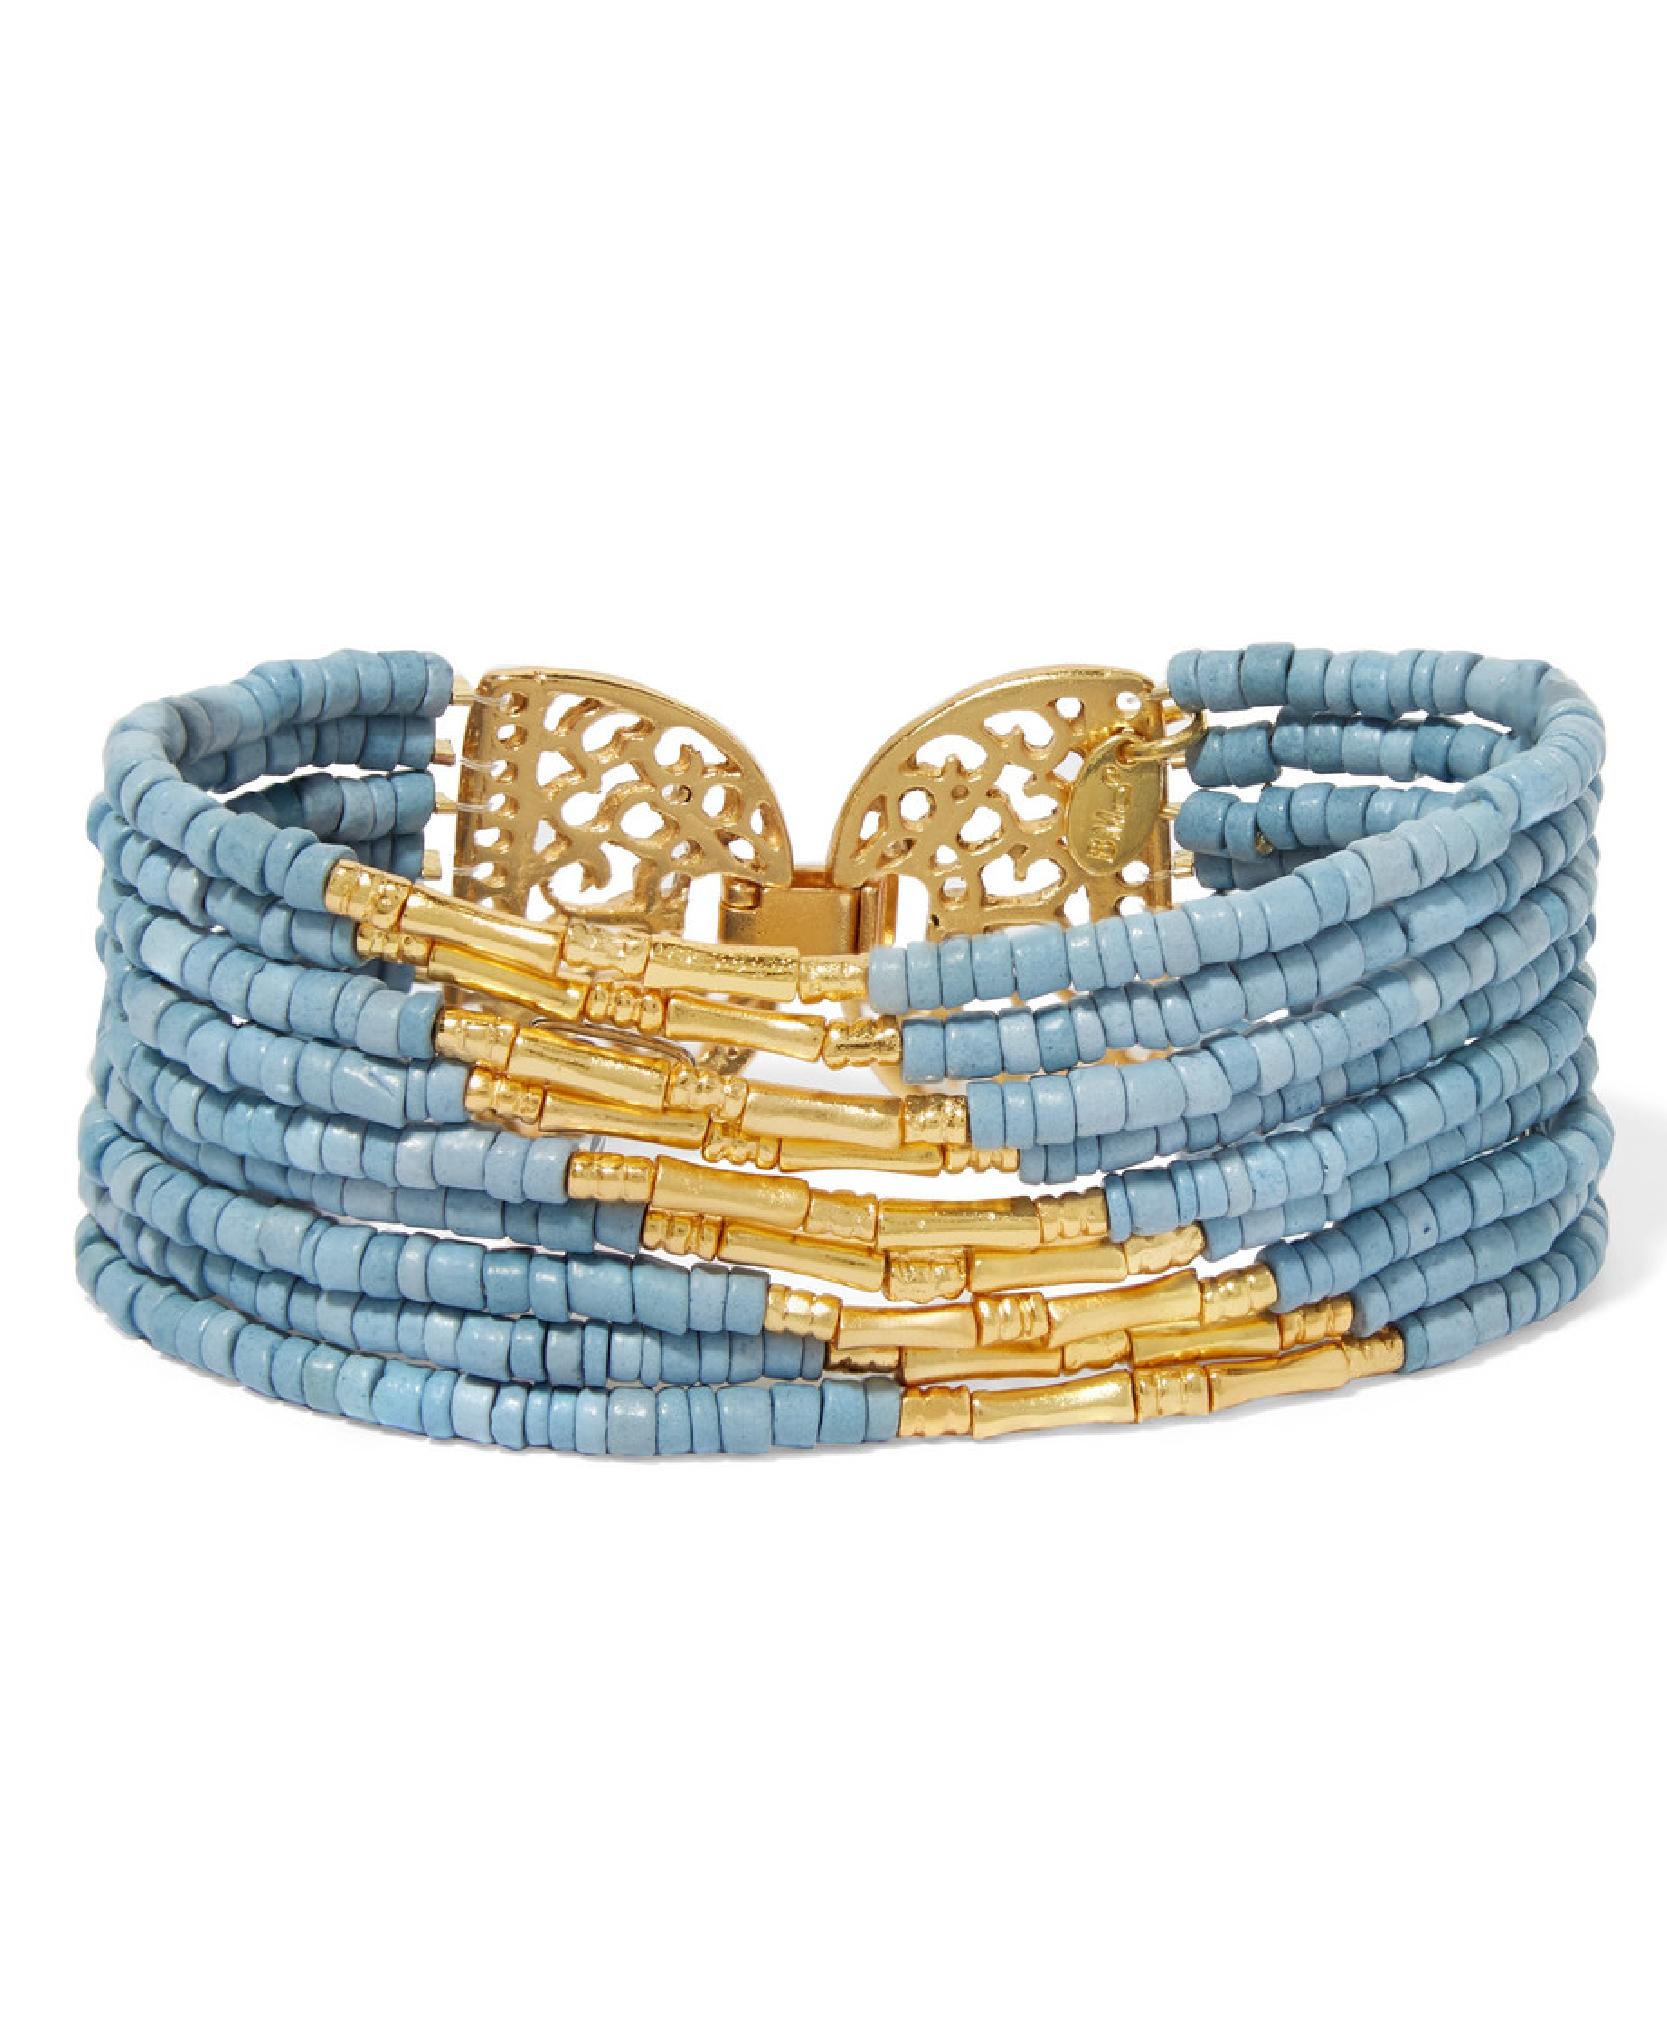 BibiI Marini - Mitu Gold-Plated And Ceramic Beaded Bracelet.